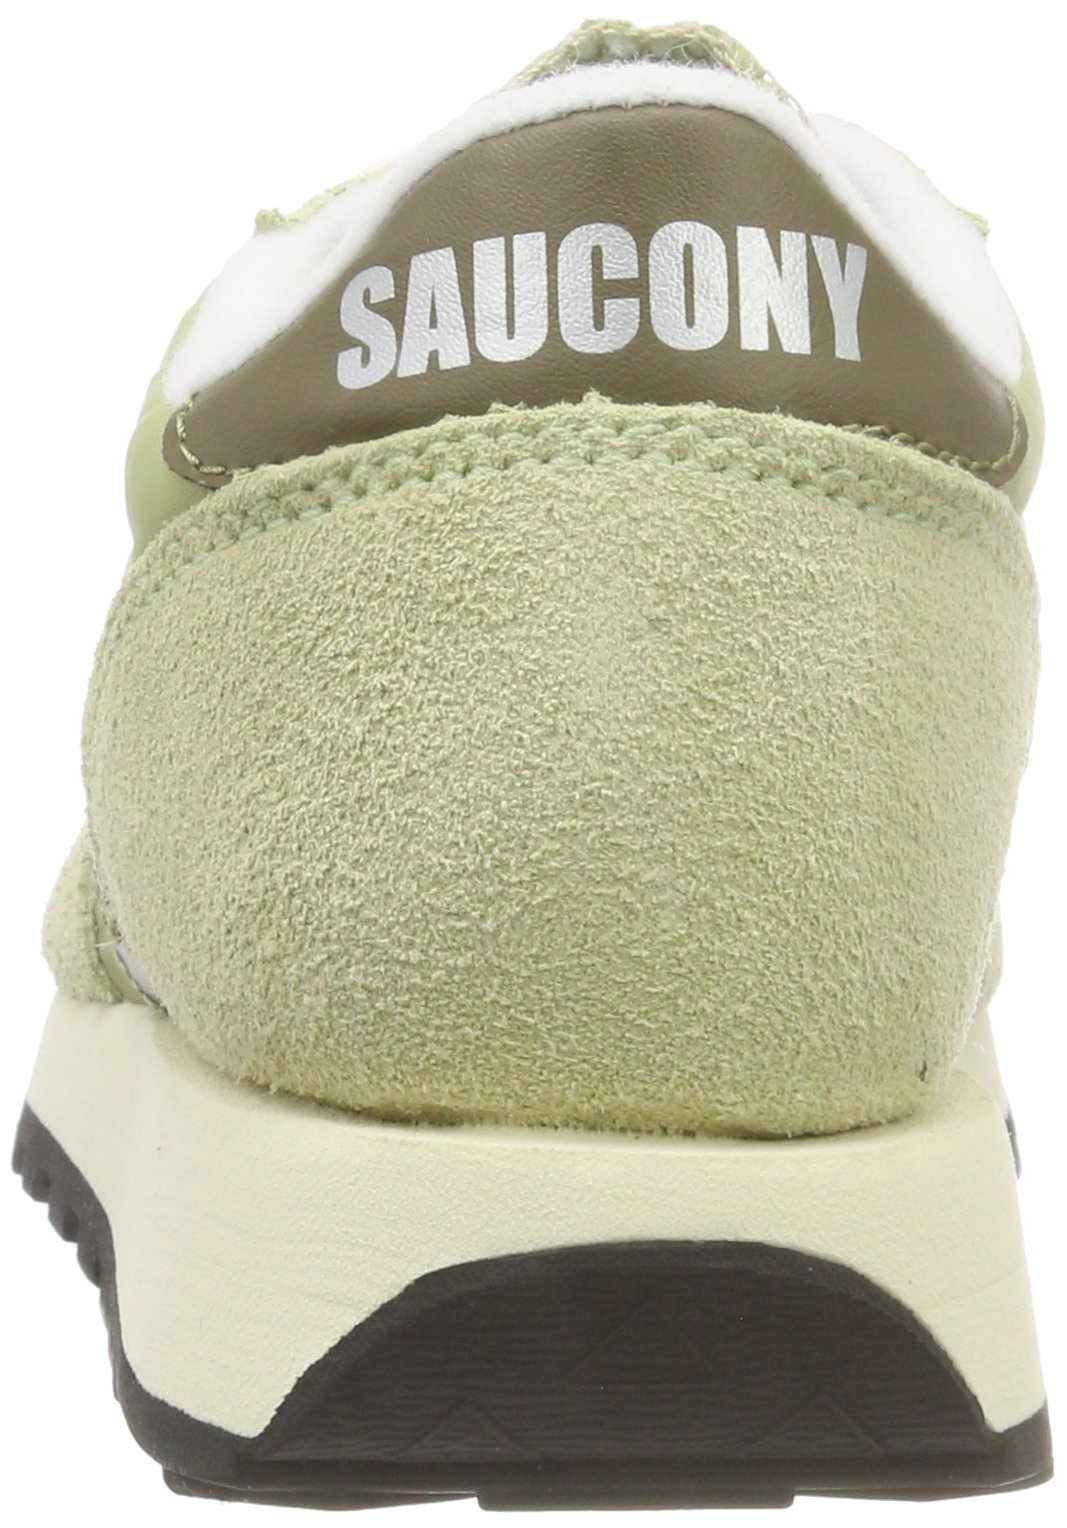 Saucony Jazz Original Vintage, Scape per Sport Outdoor Donna 2 spesavip